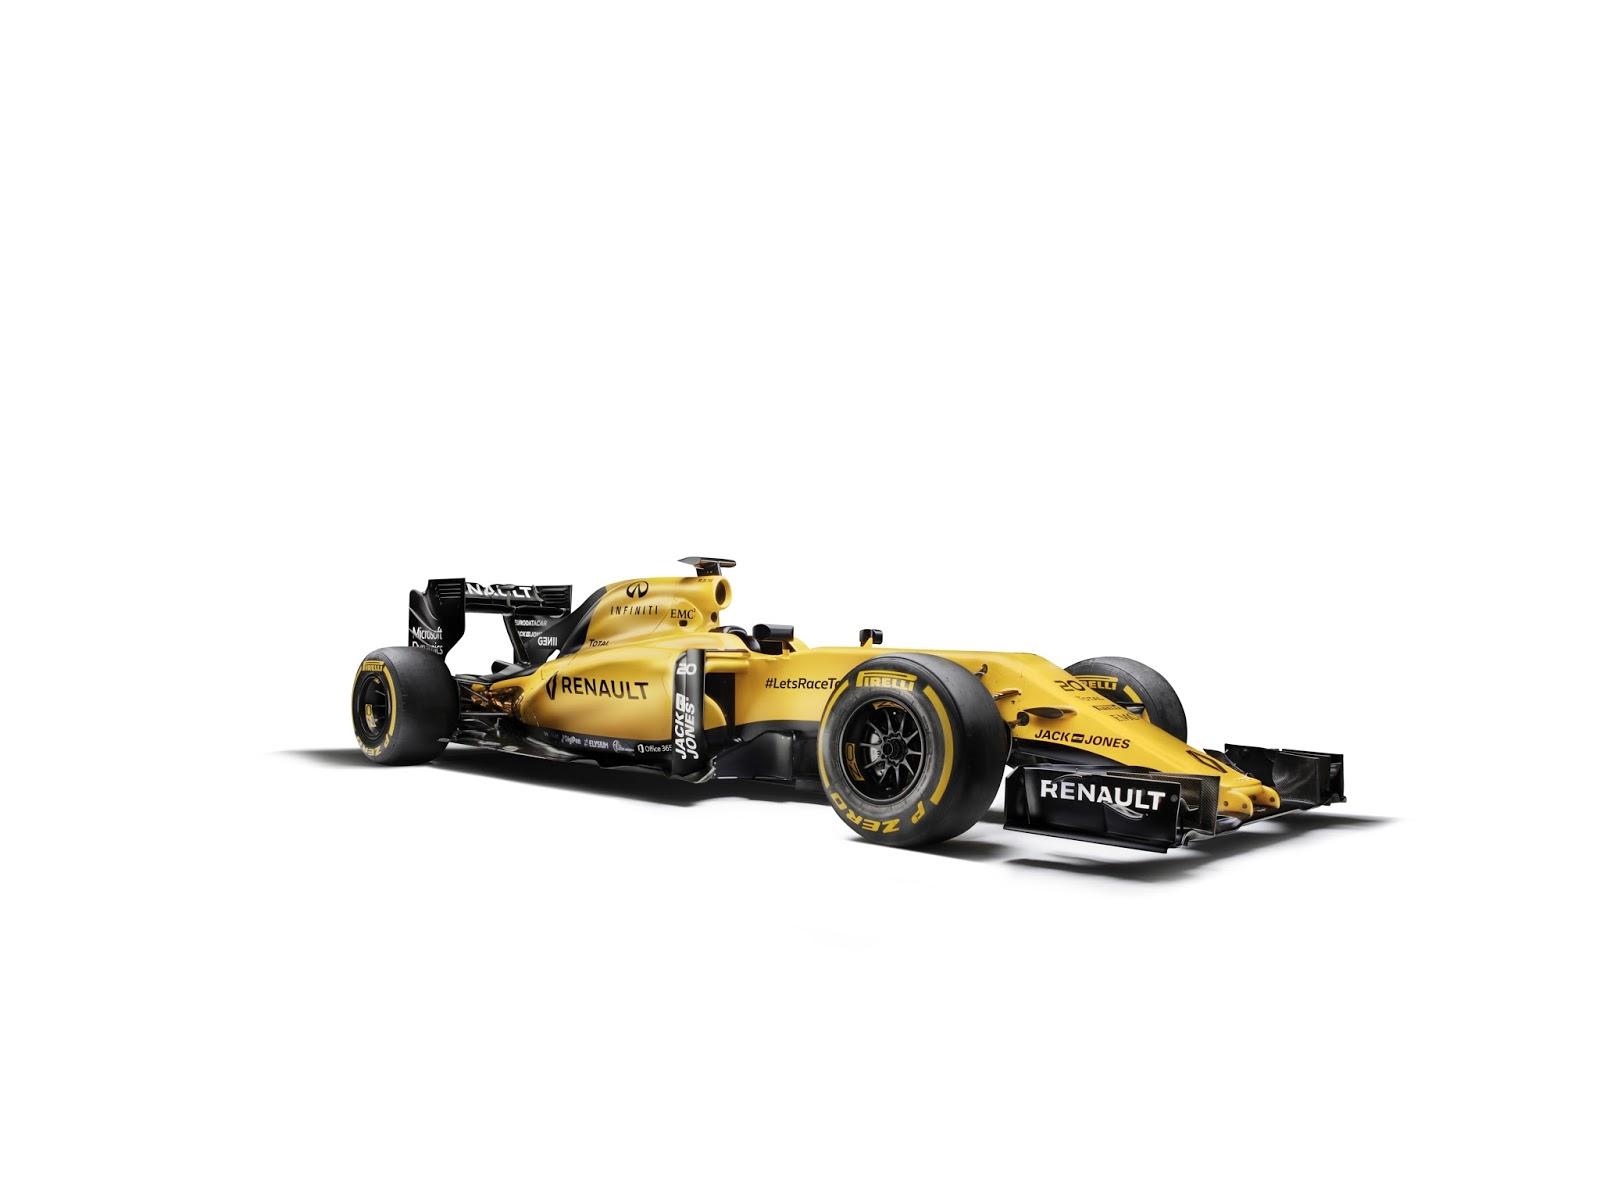 00098717 H Renault Sport Formula 1 Team επέλεξε ένα μοναδικό τρόπο για να παρουσιάσει τα νέα χρώματα της ομάδας